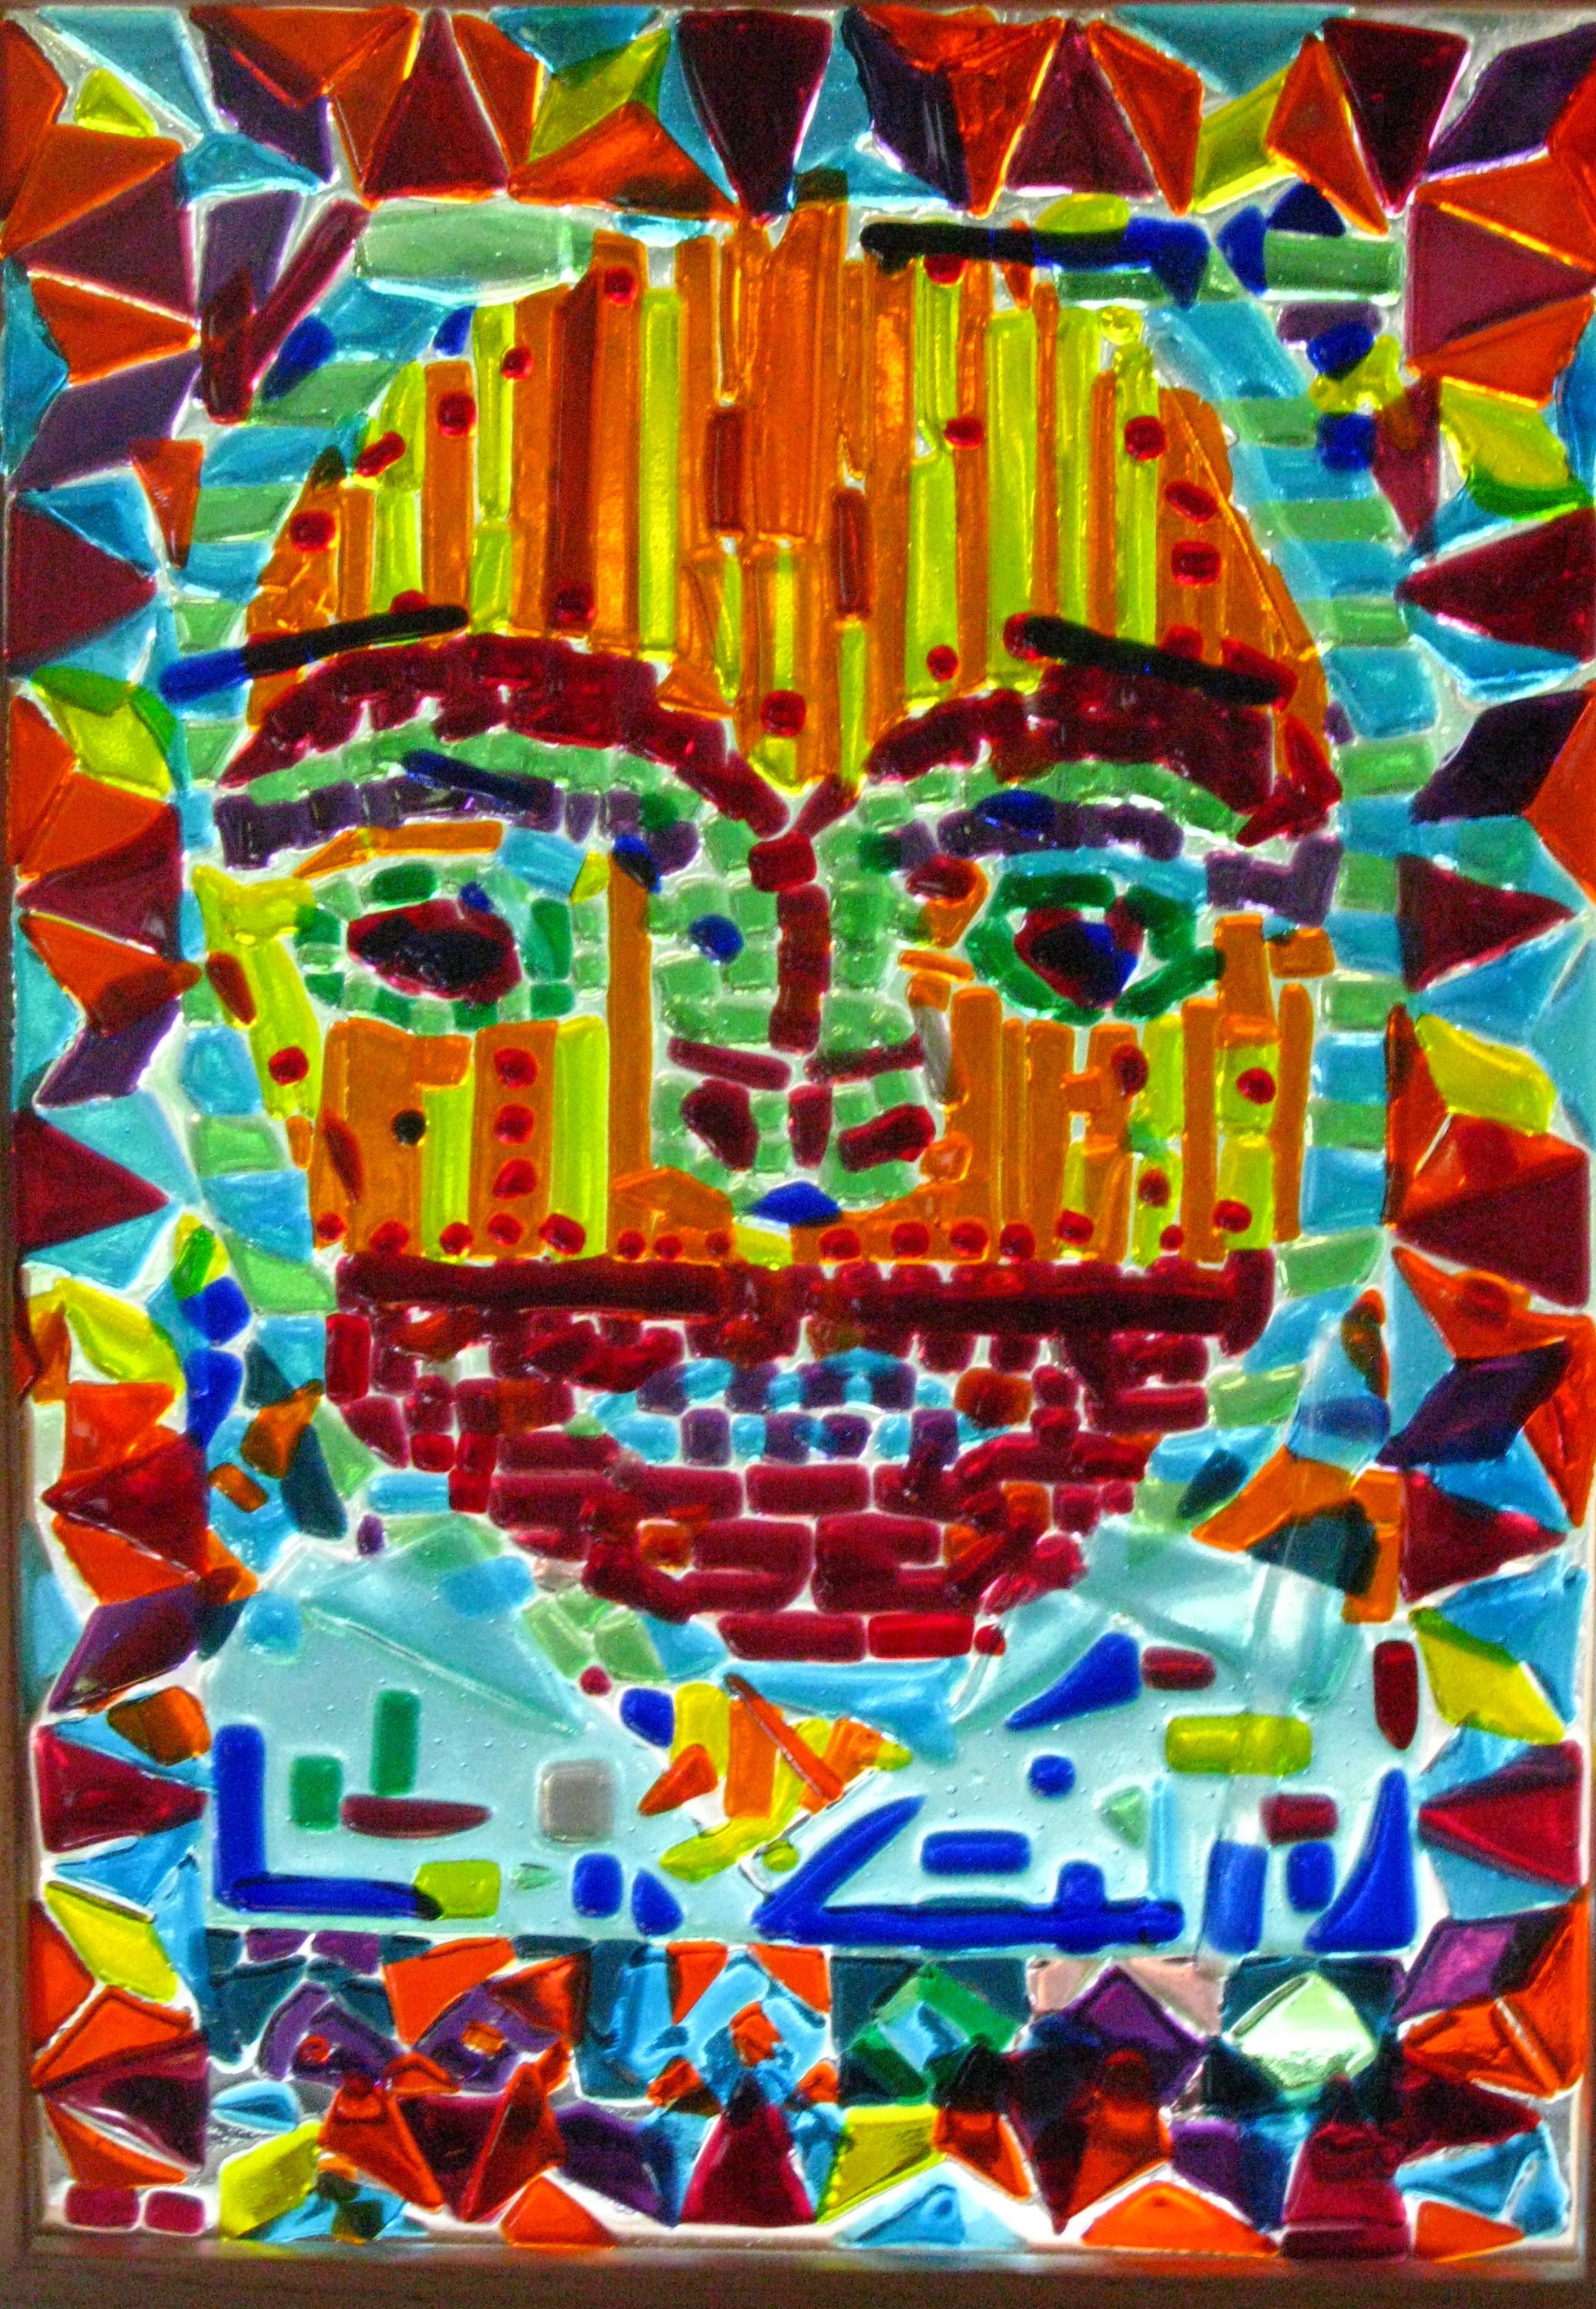 01_mask_IMG_0003-1 6-17-2009 1-53-55 PM.JPG